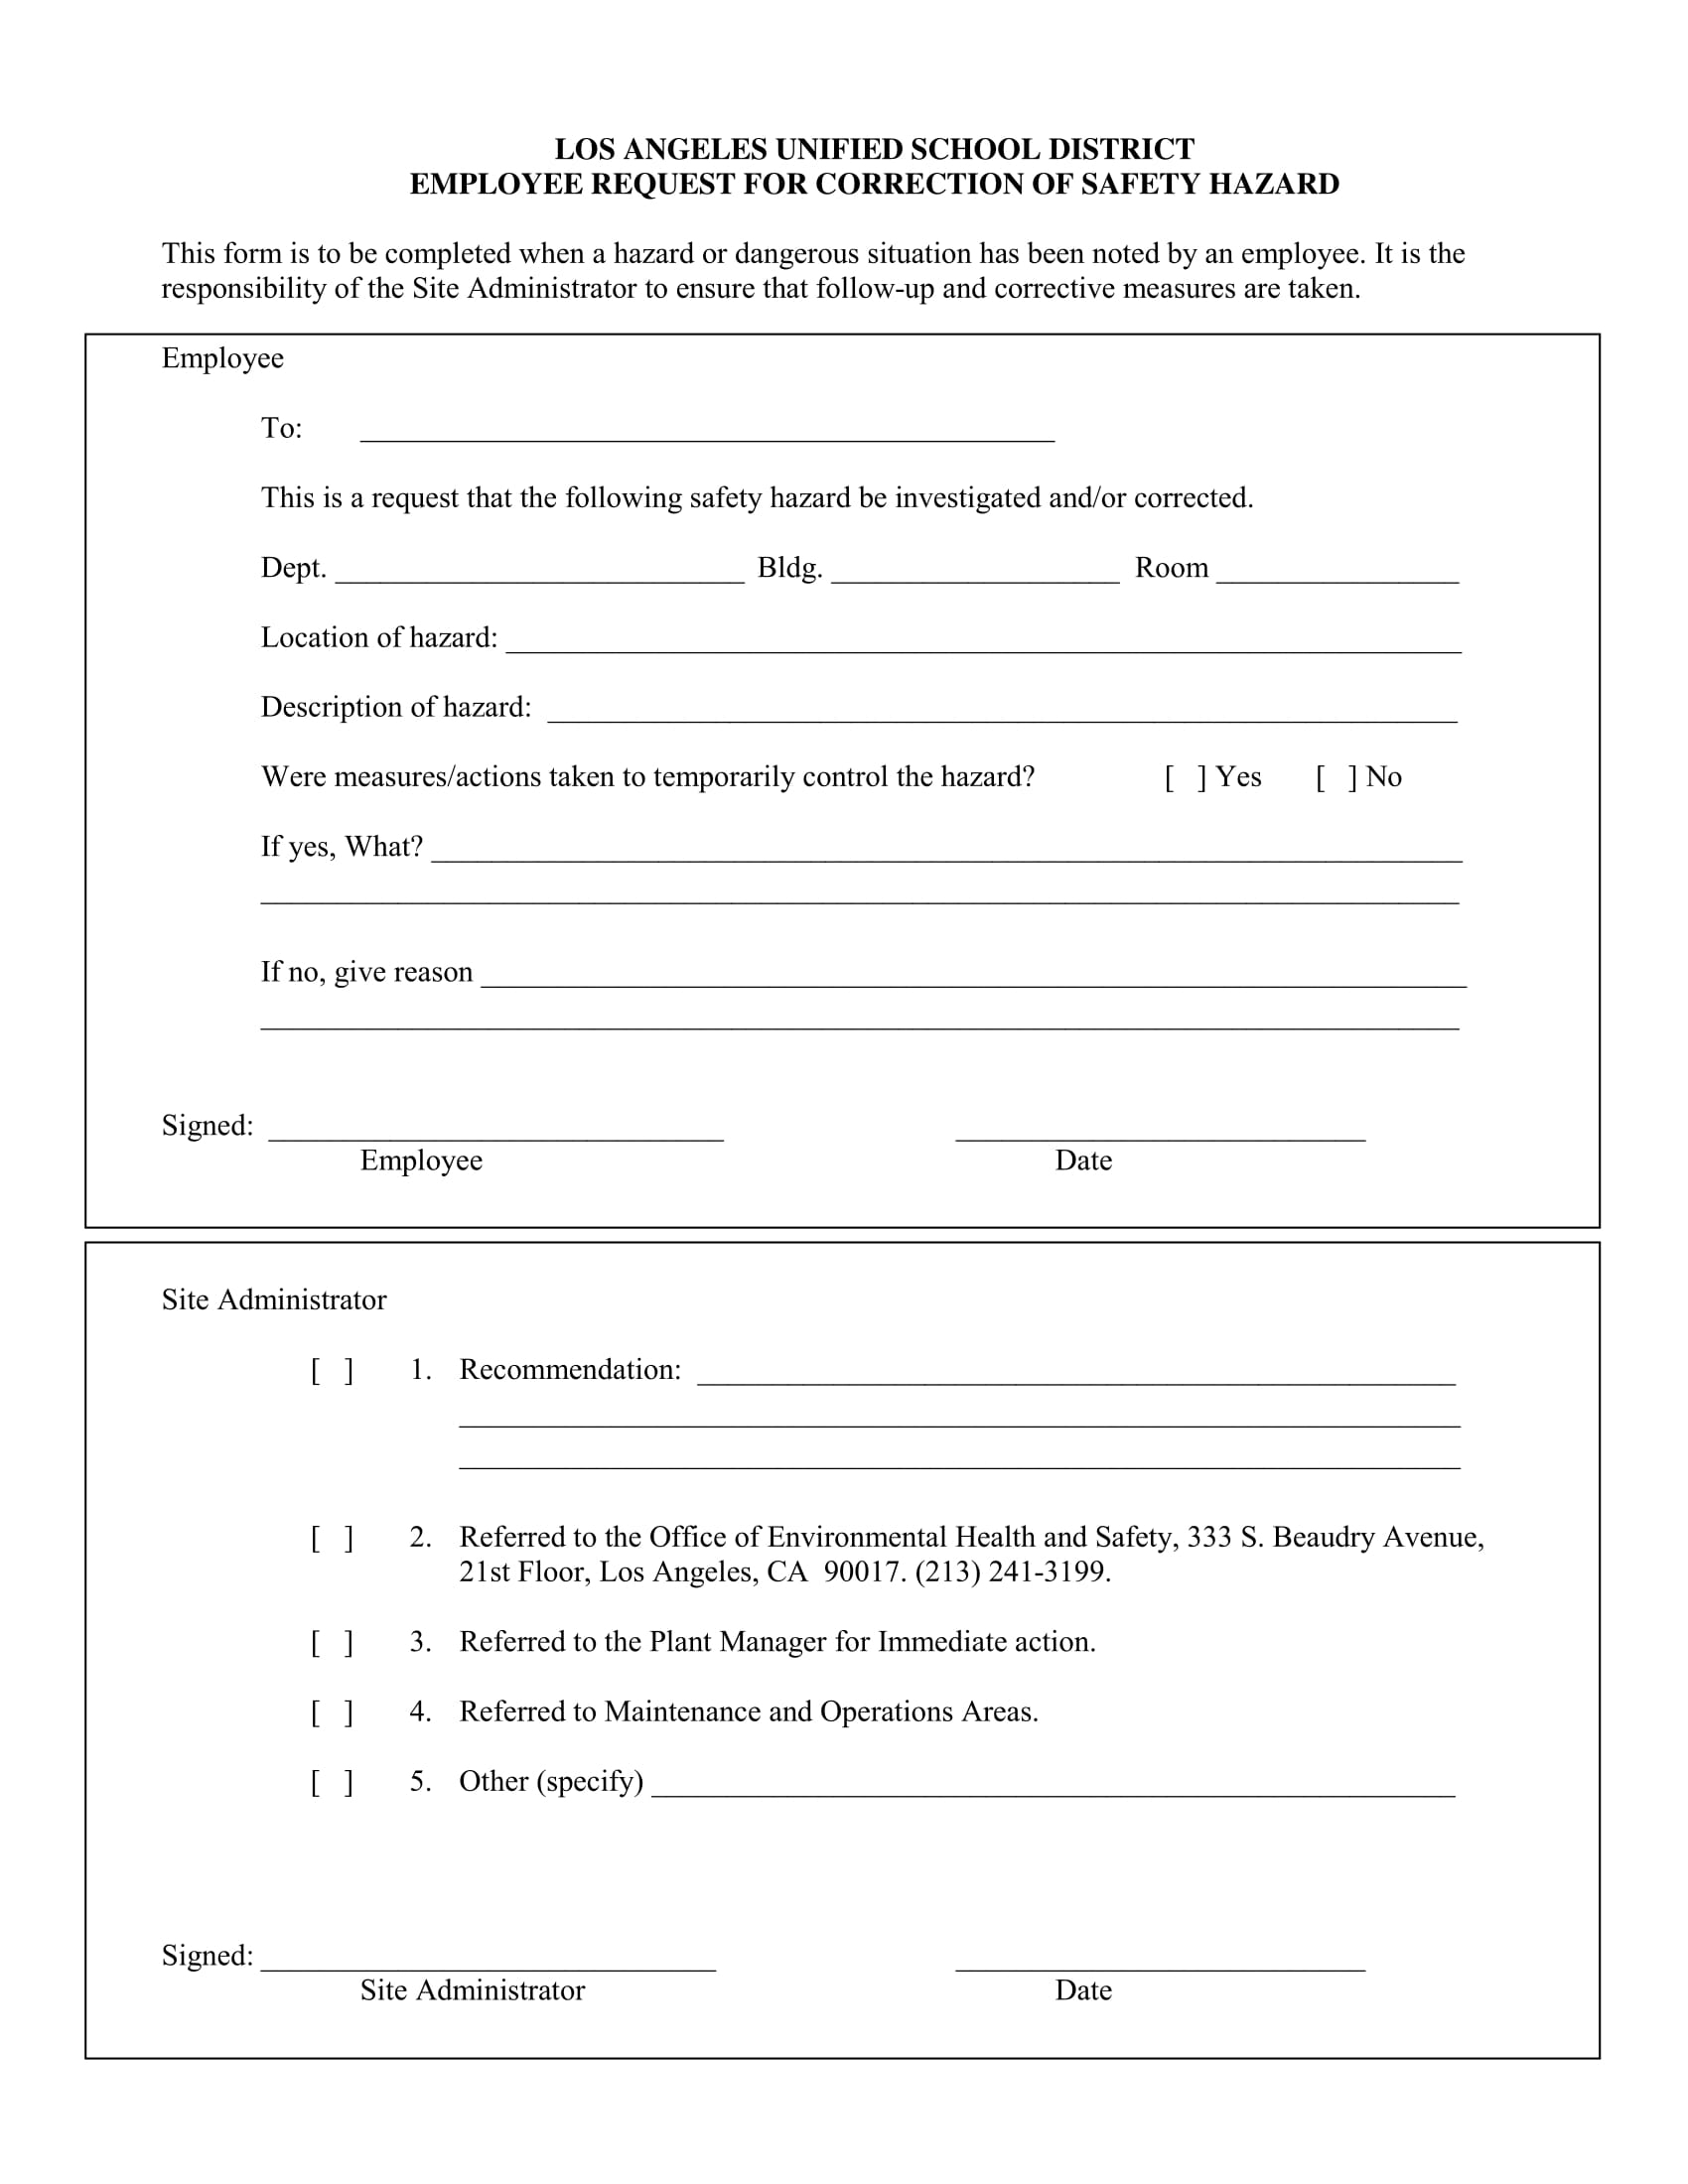 employee safety hazard correction form 1